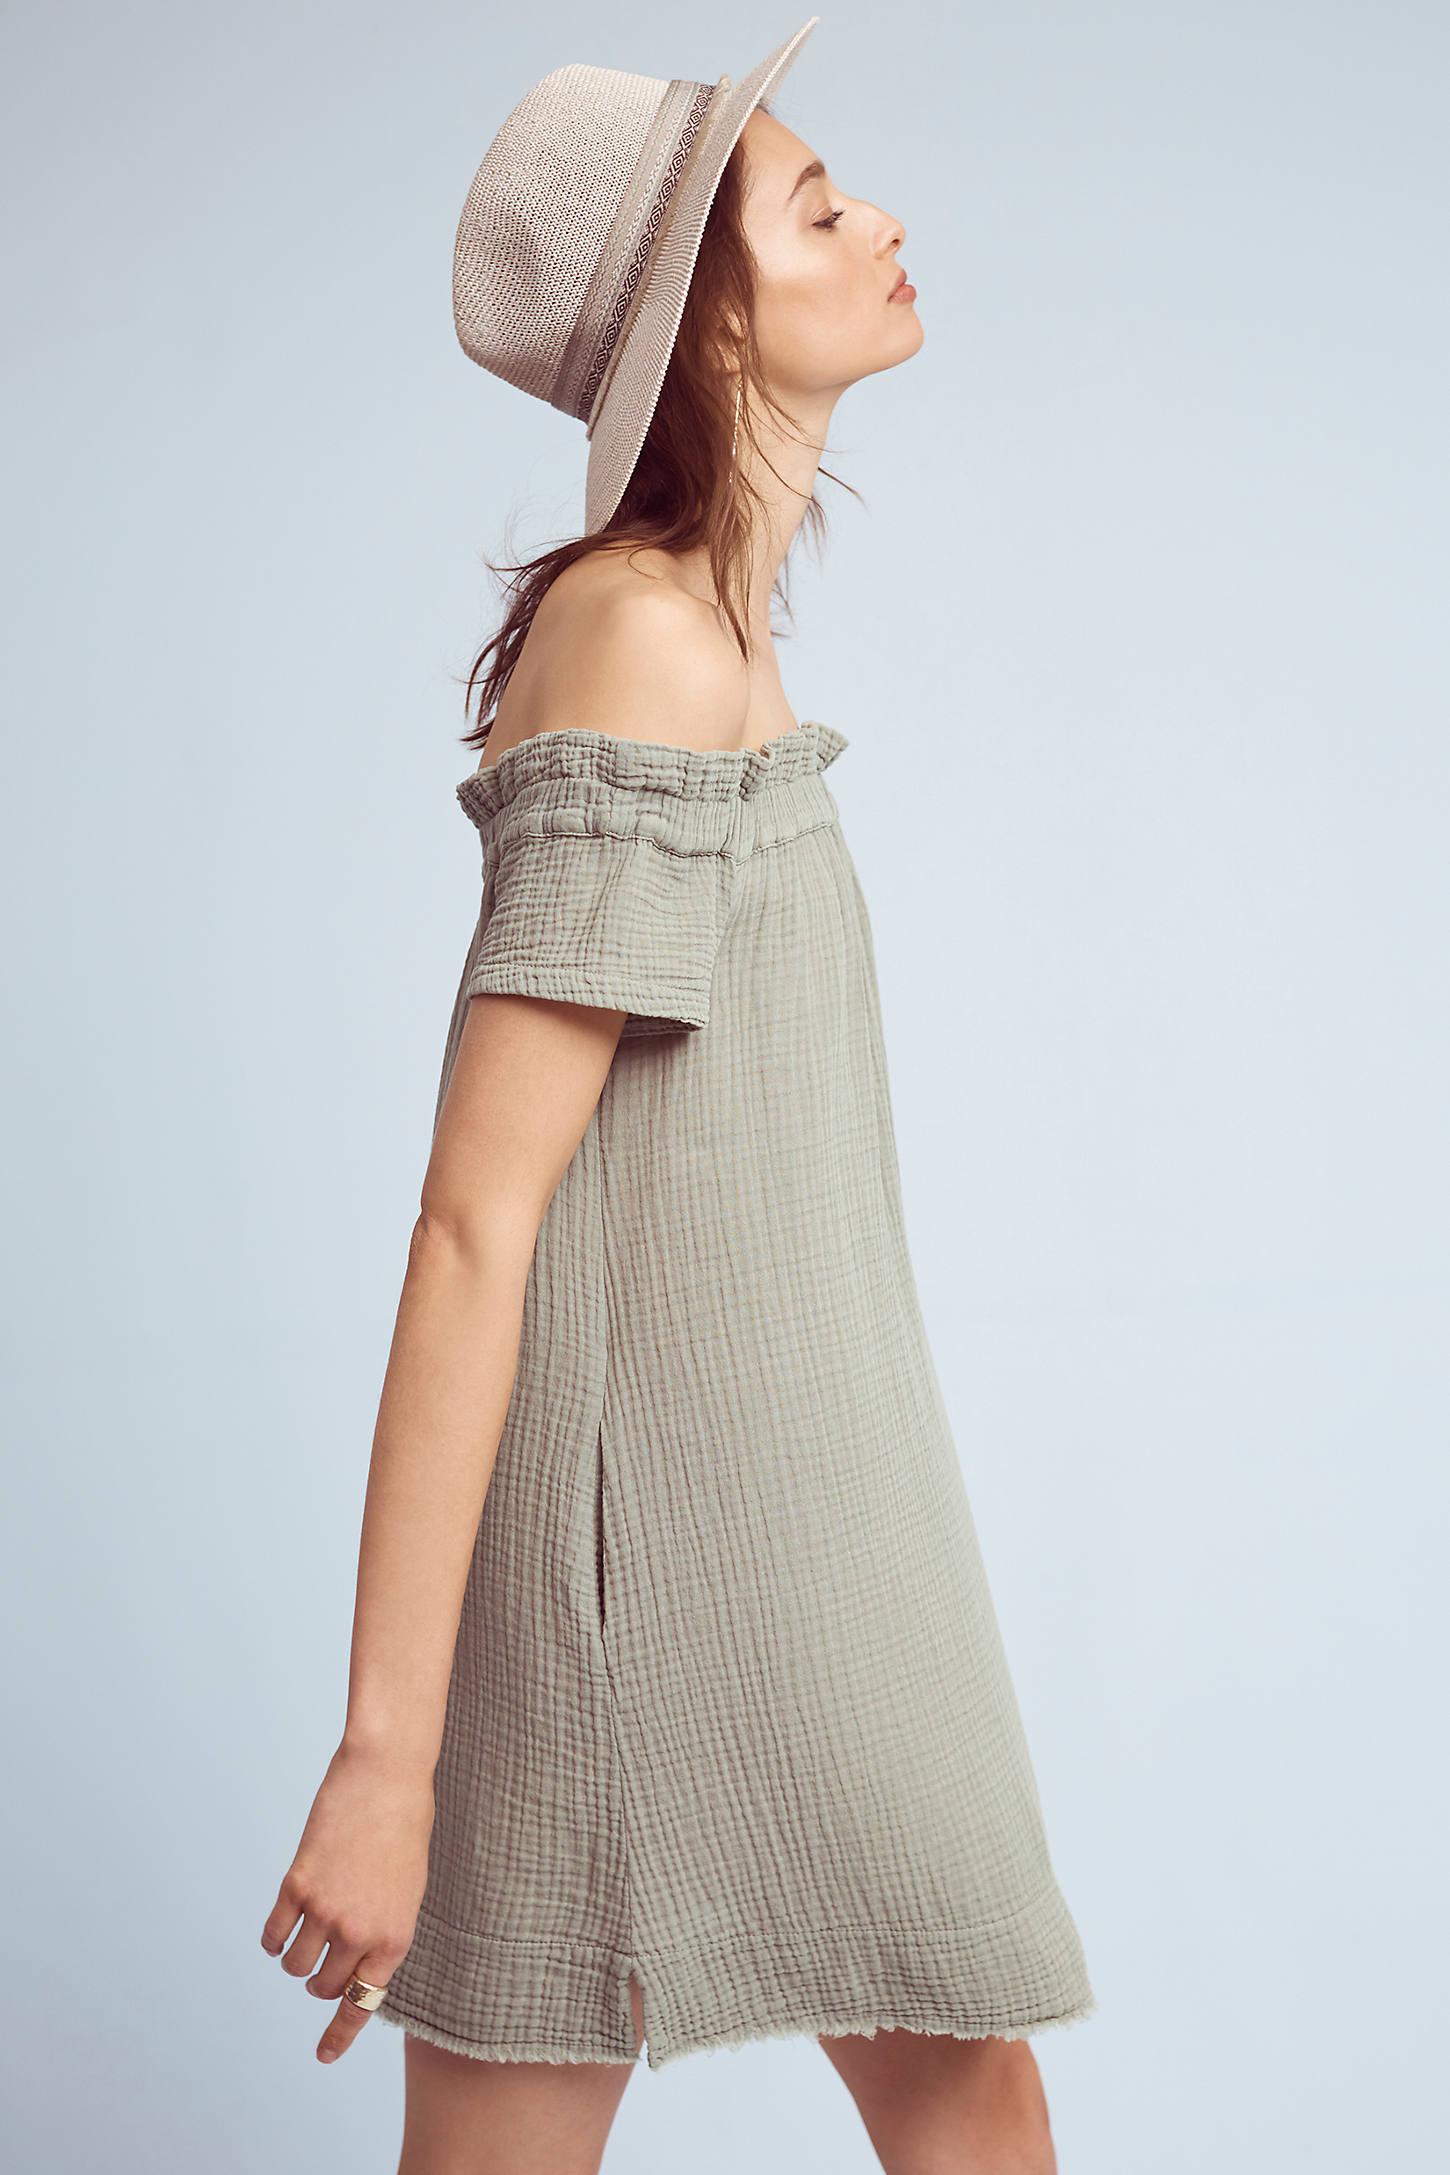 Maella Off-The-Shoulder Tunic Dress